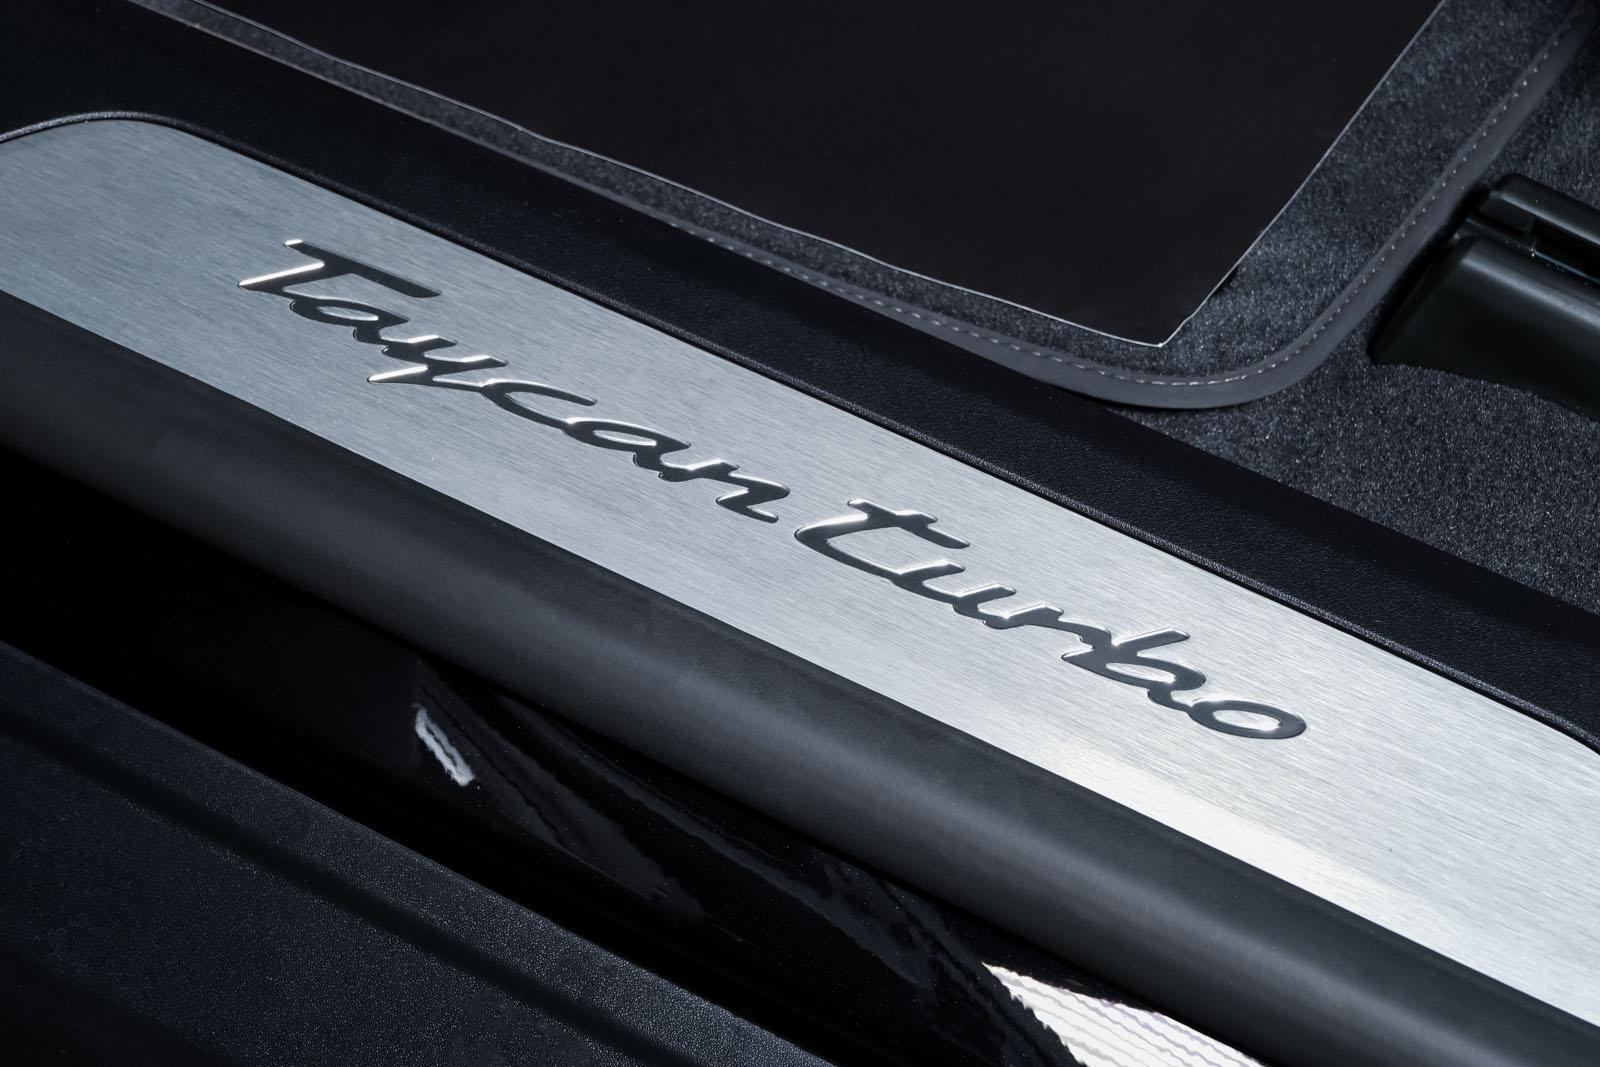 Porsche_Taycan_Turbo_Schwarz_Schwarz_POR-8106_10_w